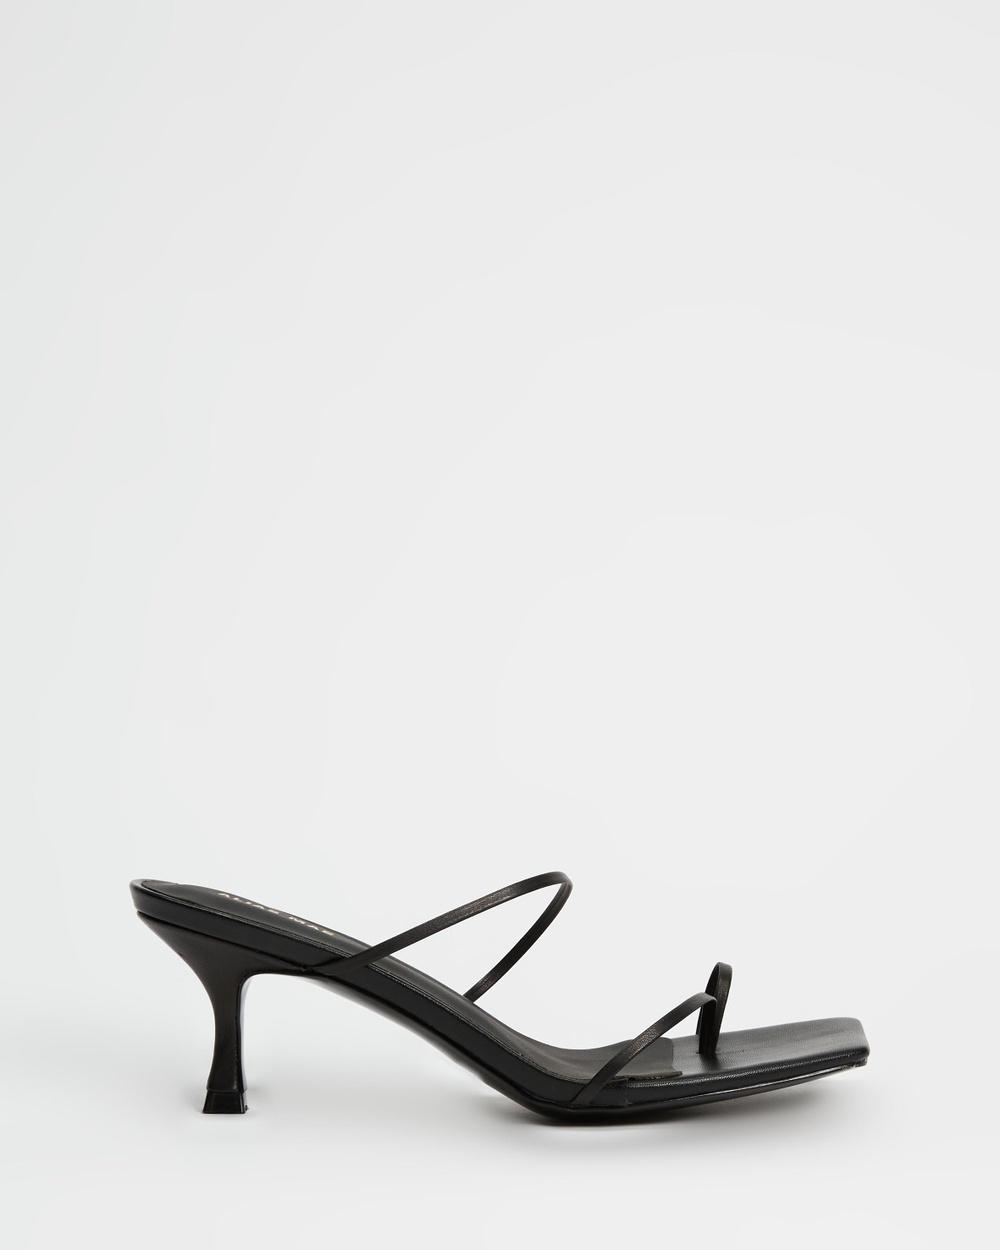 Alias Mae Bay Sandals Black Leather